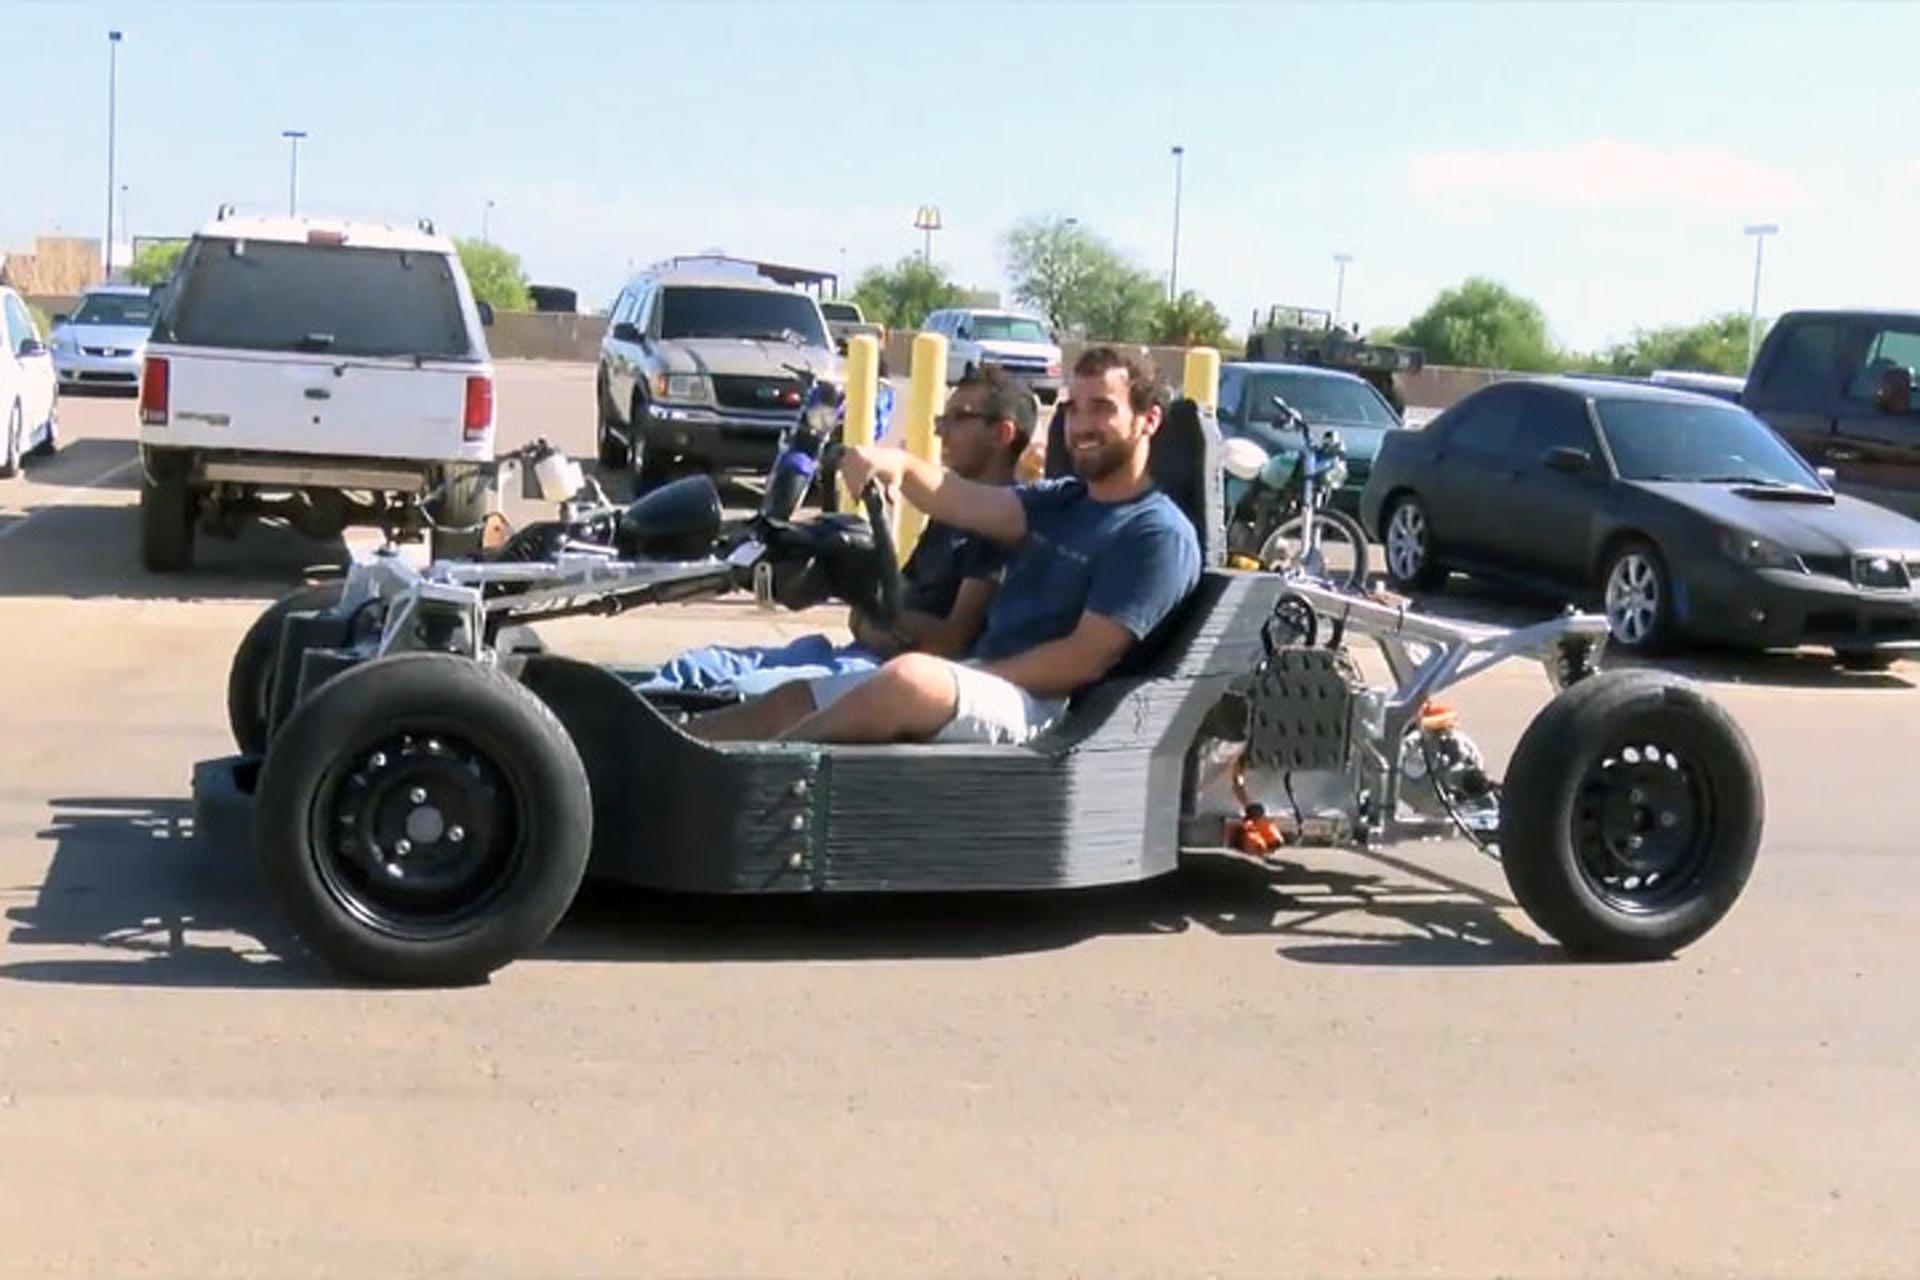 Local Motors Reveals 3D Printed Car Design, Shows Off Test Mule